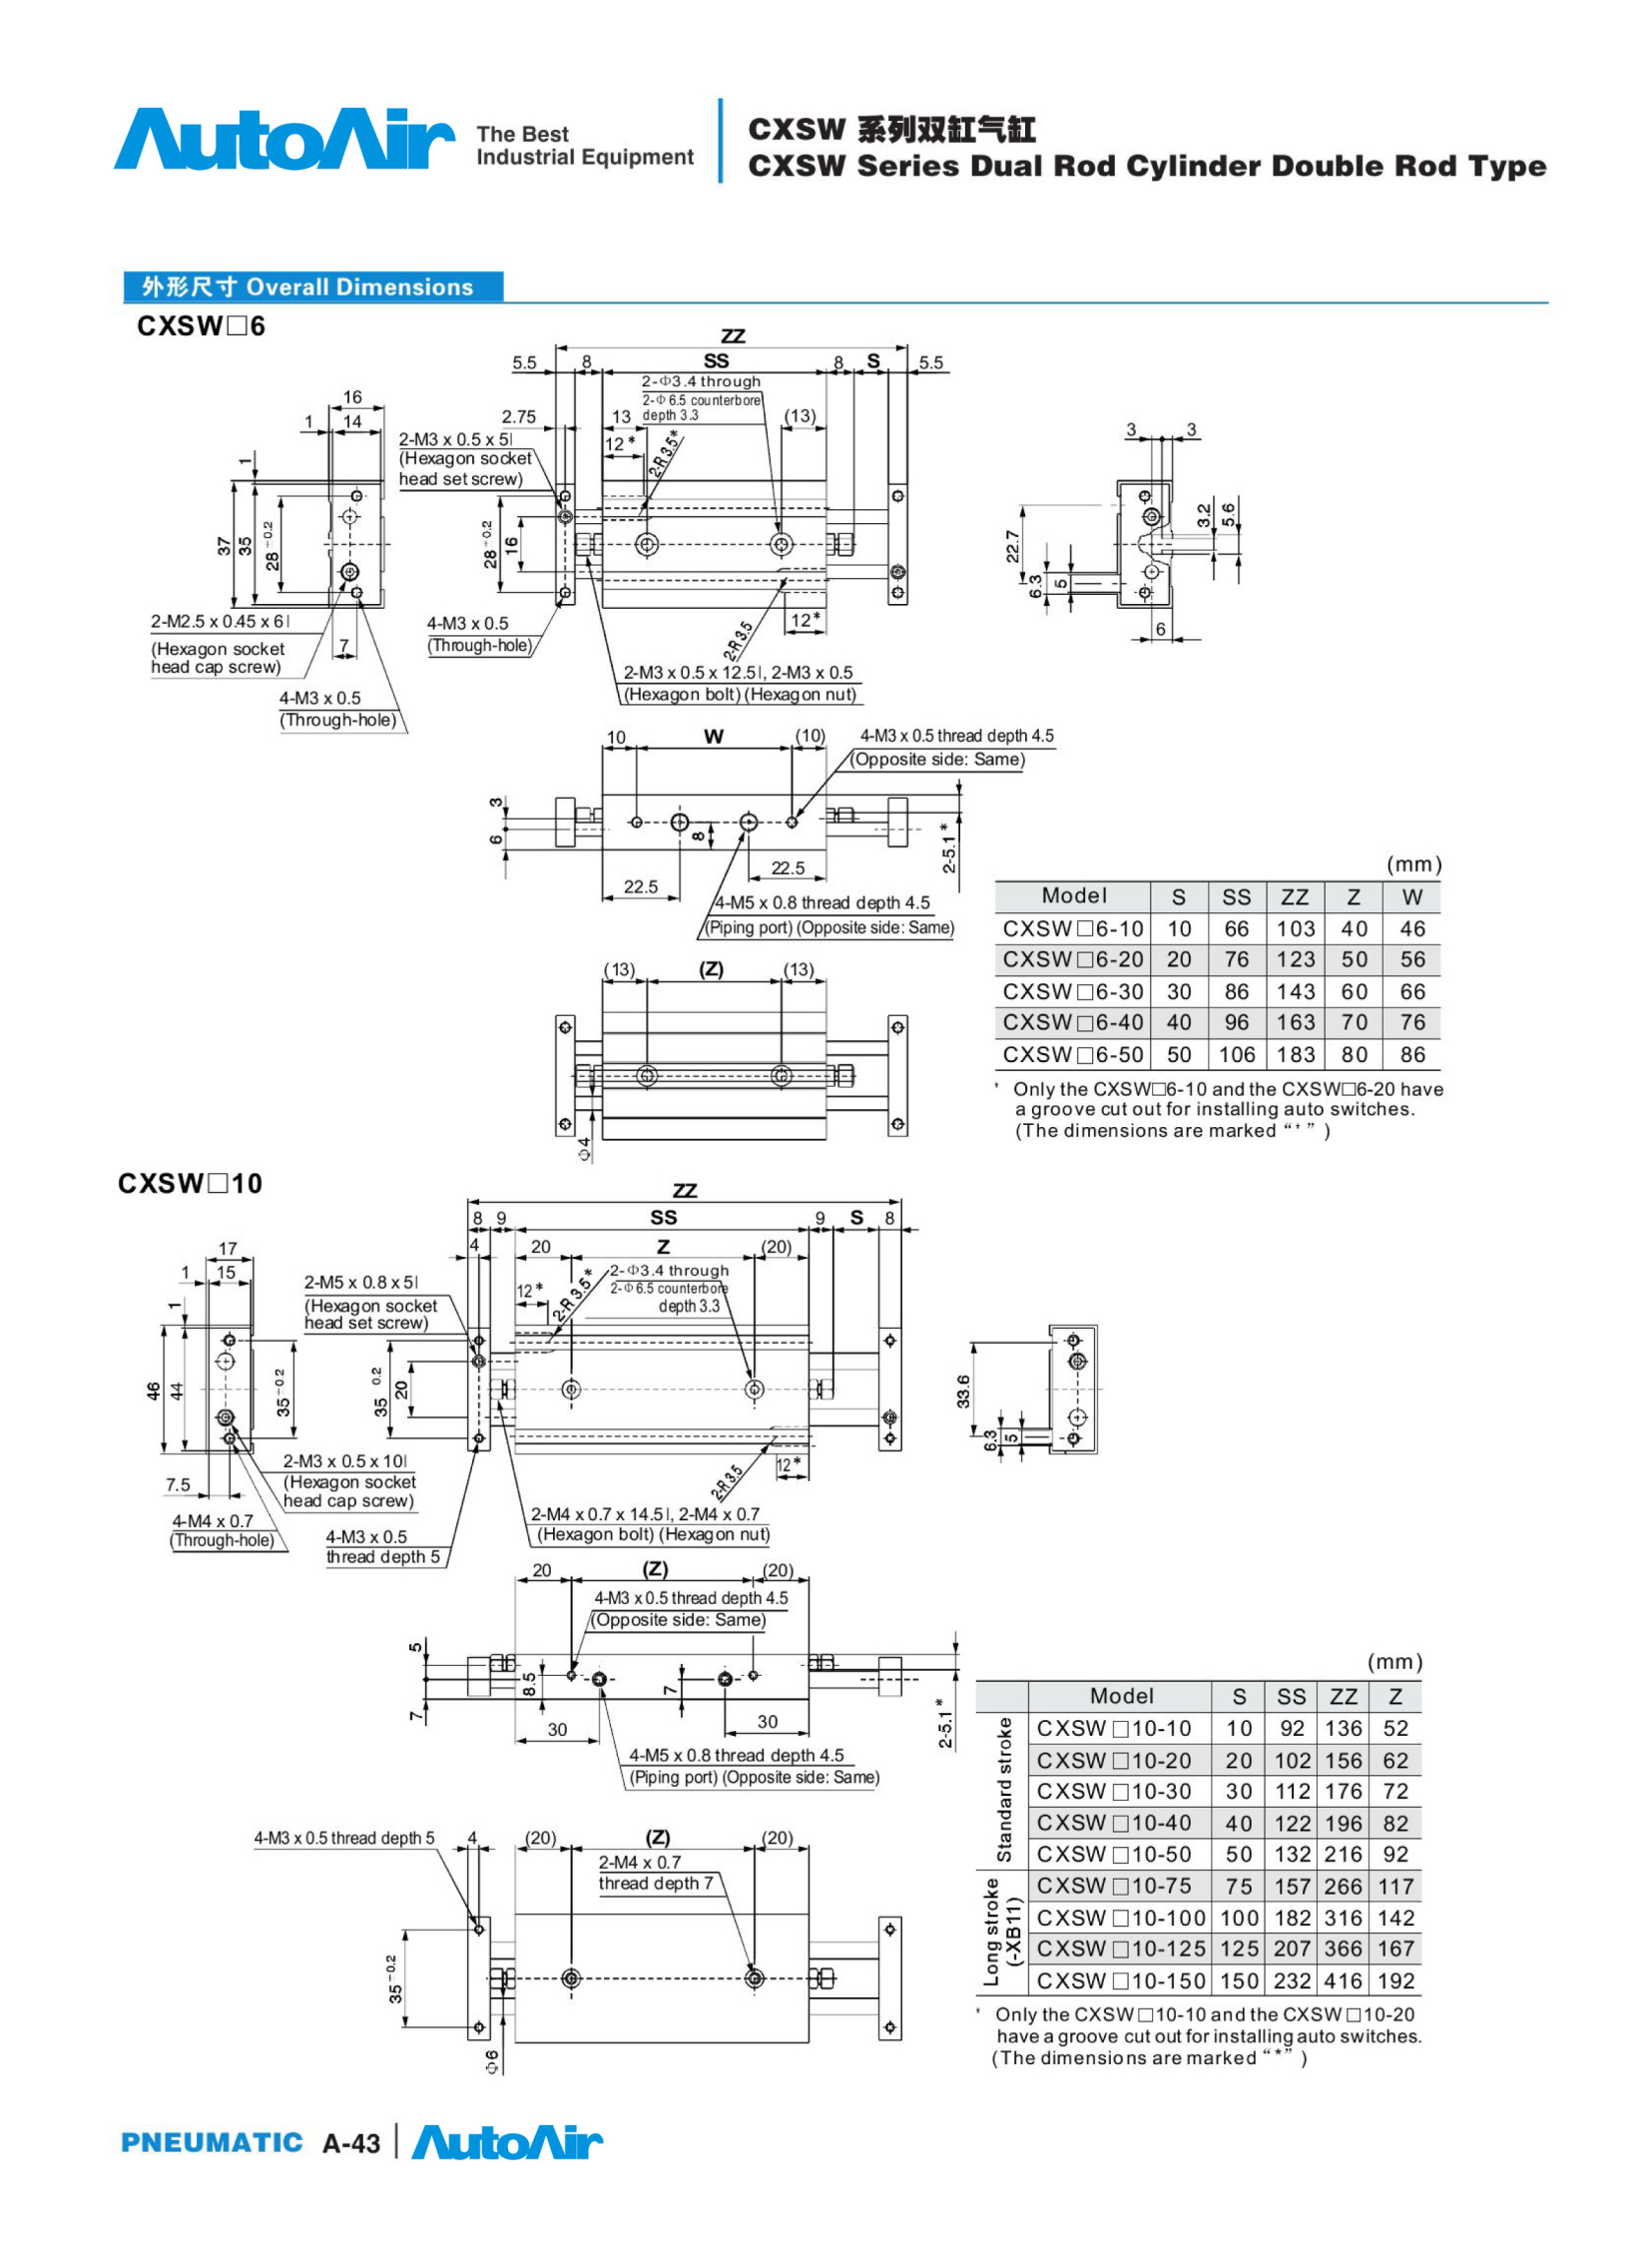 pneumatic cylinder(43)